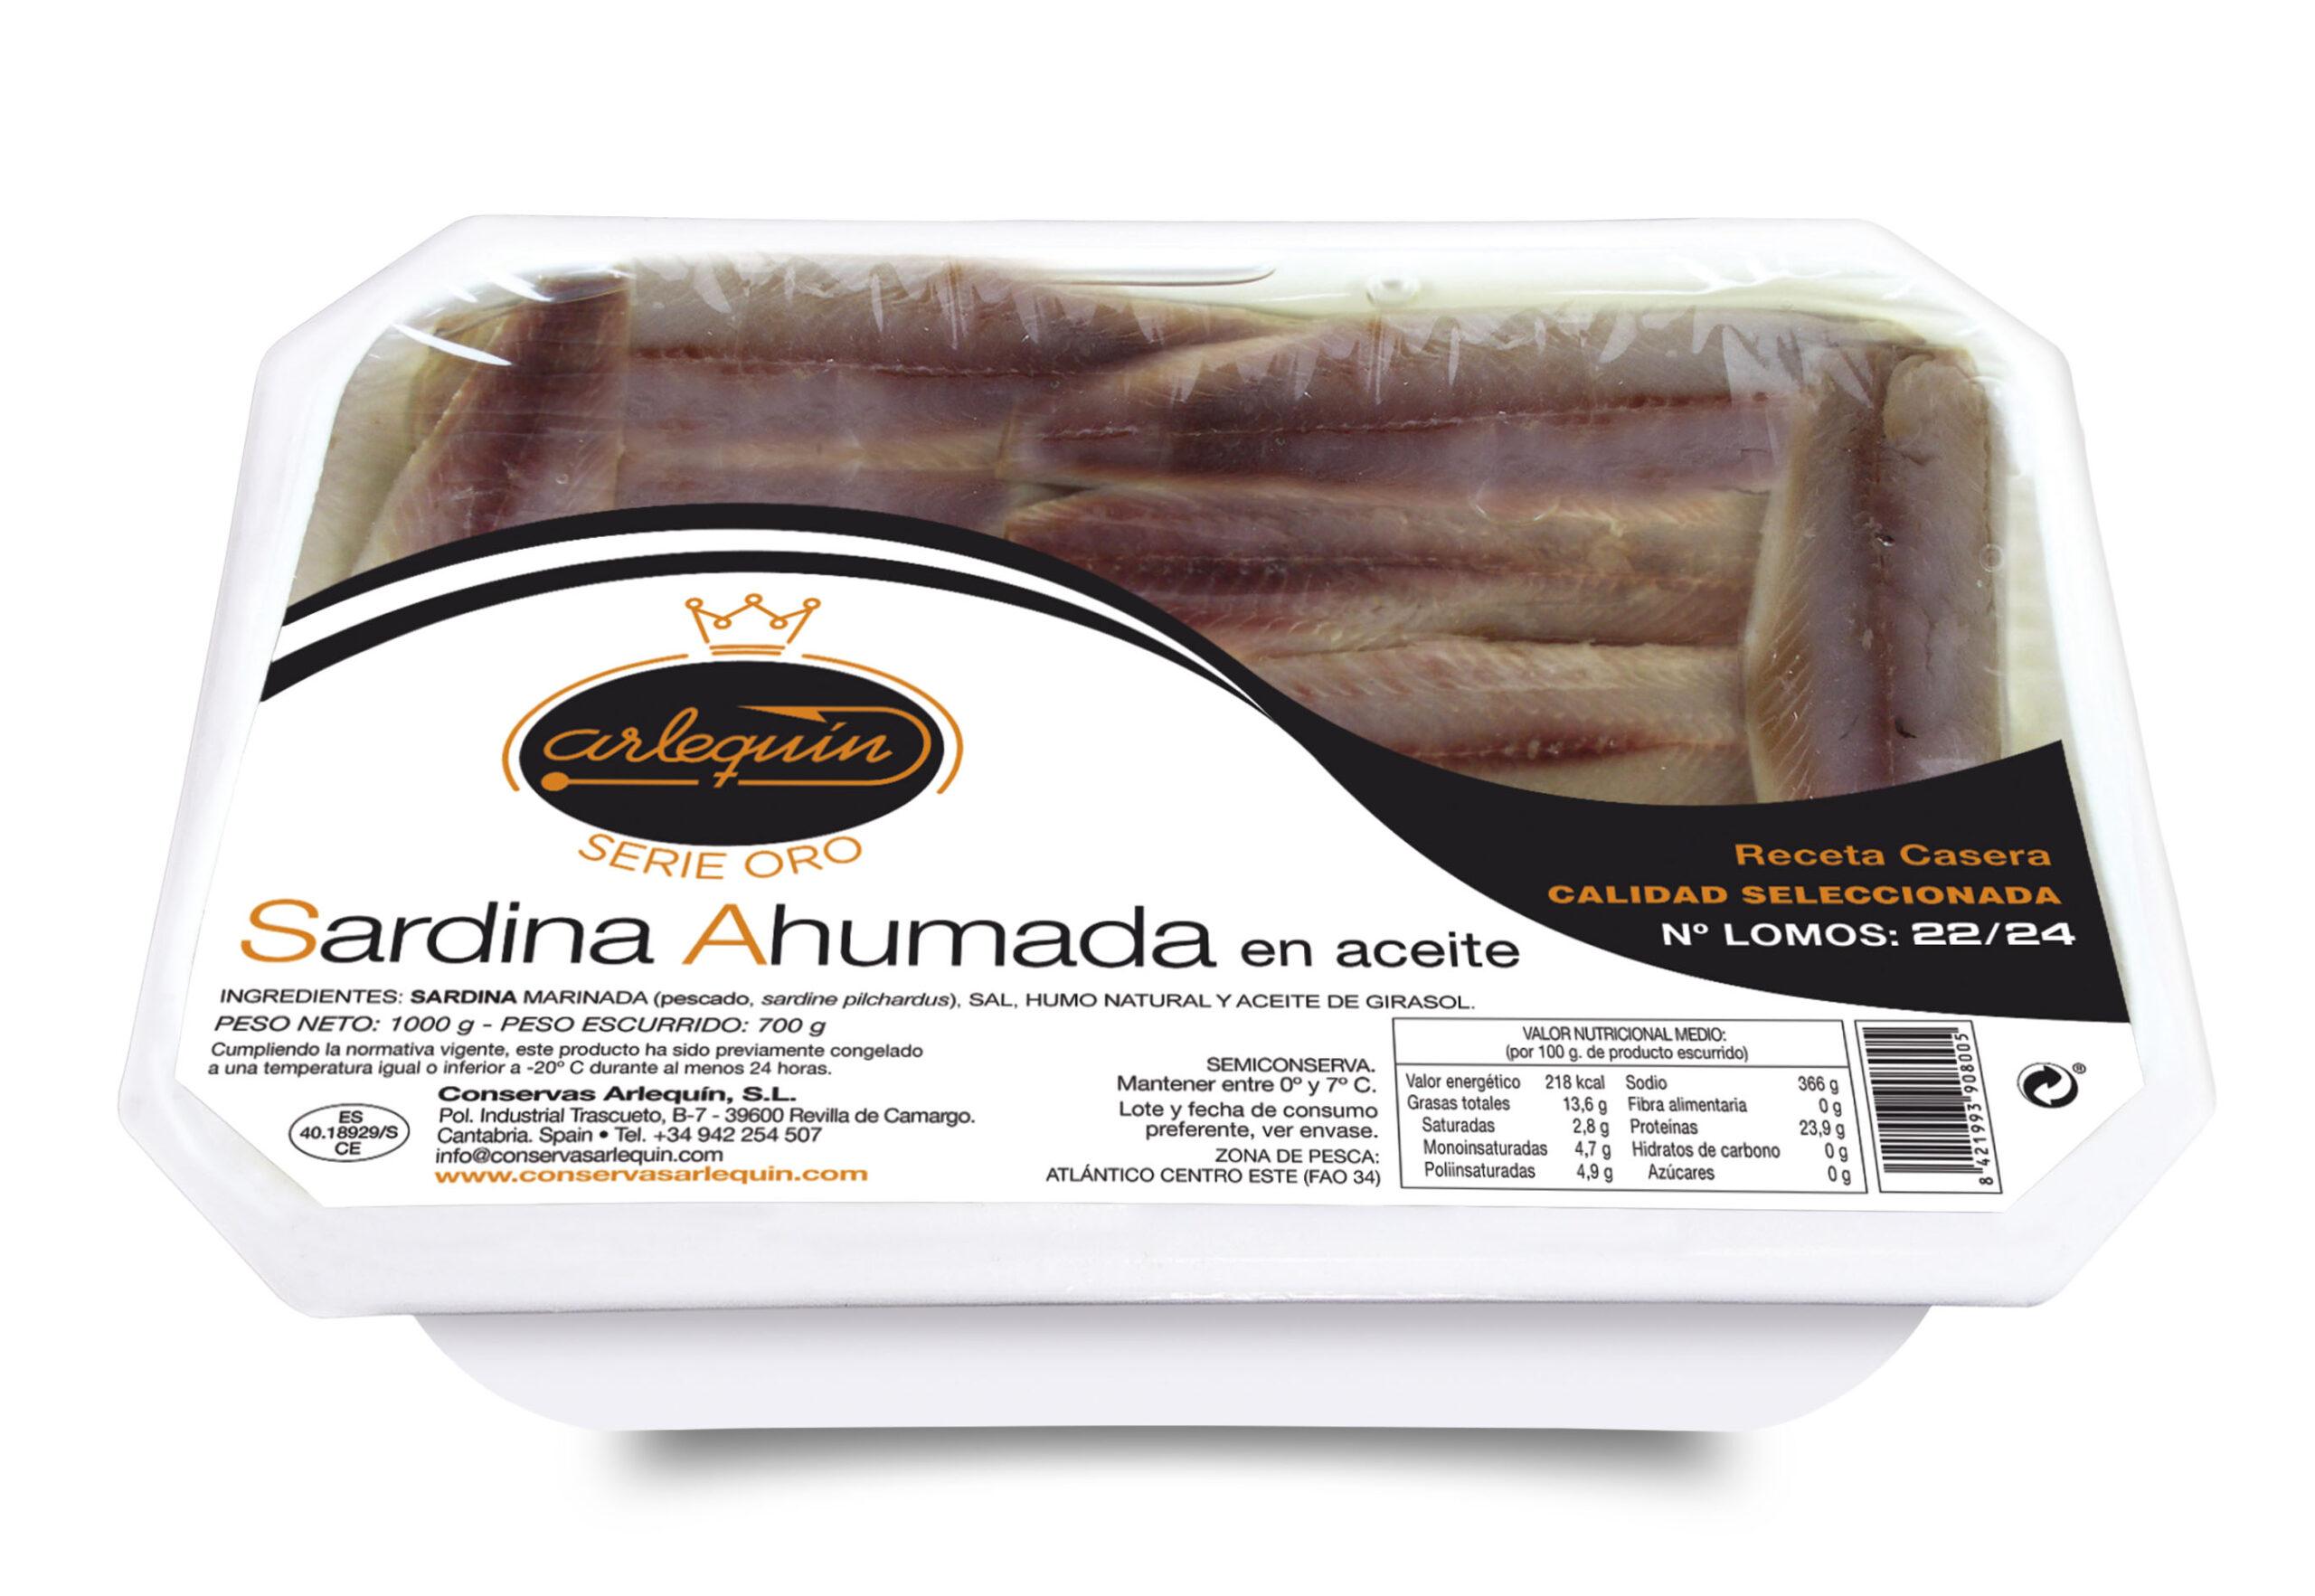 Sardina Ahumada - Arlequín Serie Oro